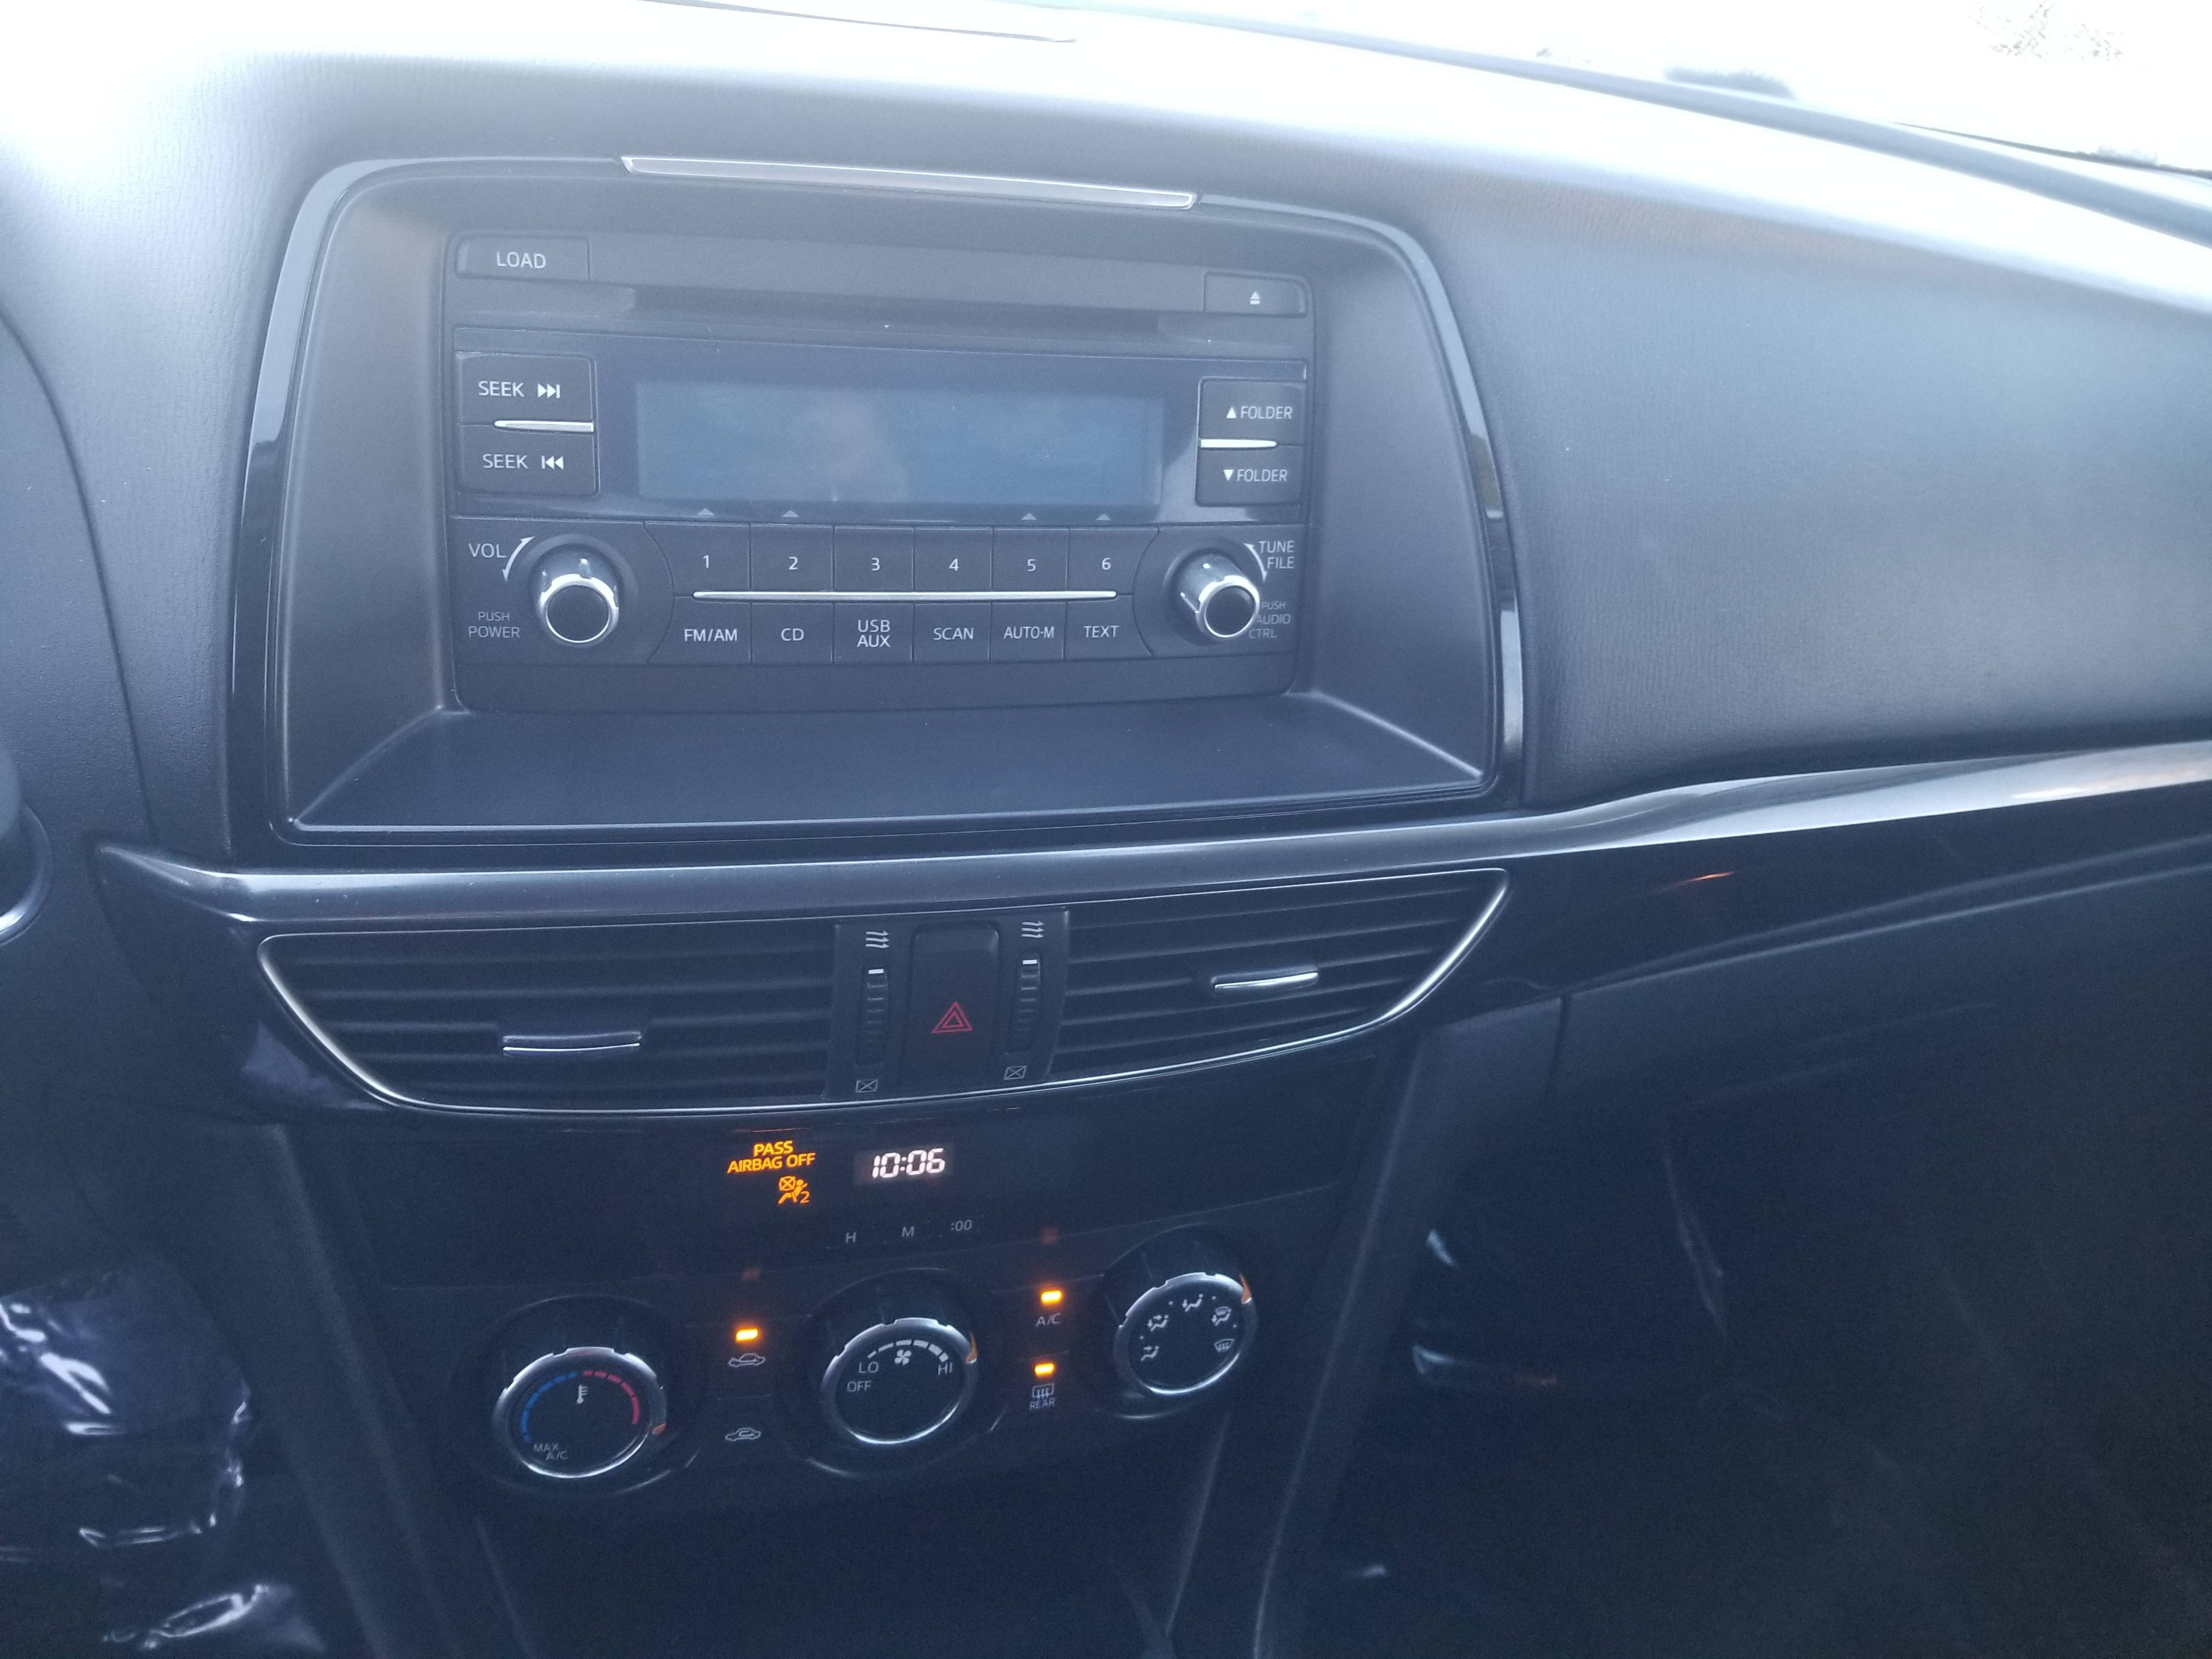 used vehicle - Sedan MAZDA MAZDA6 2015